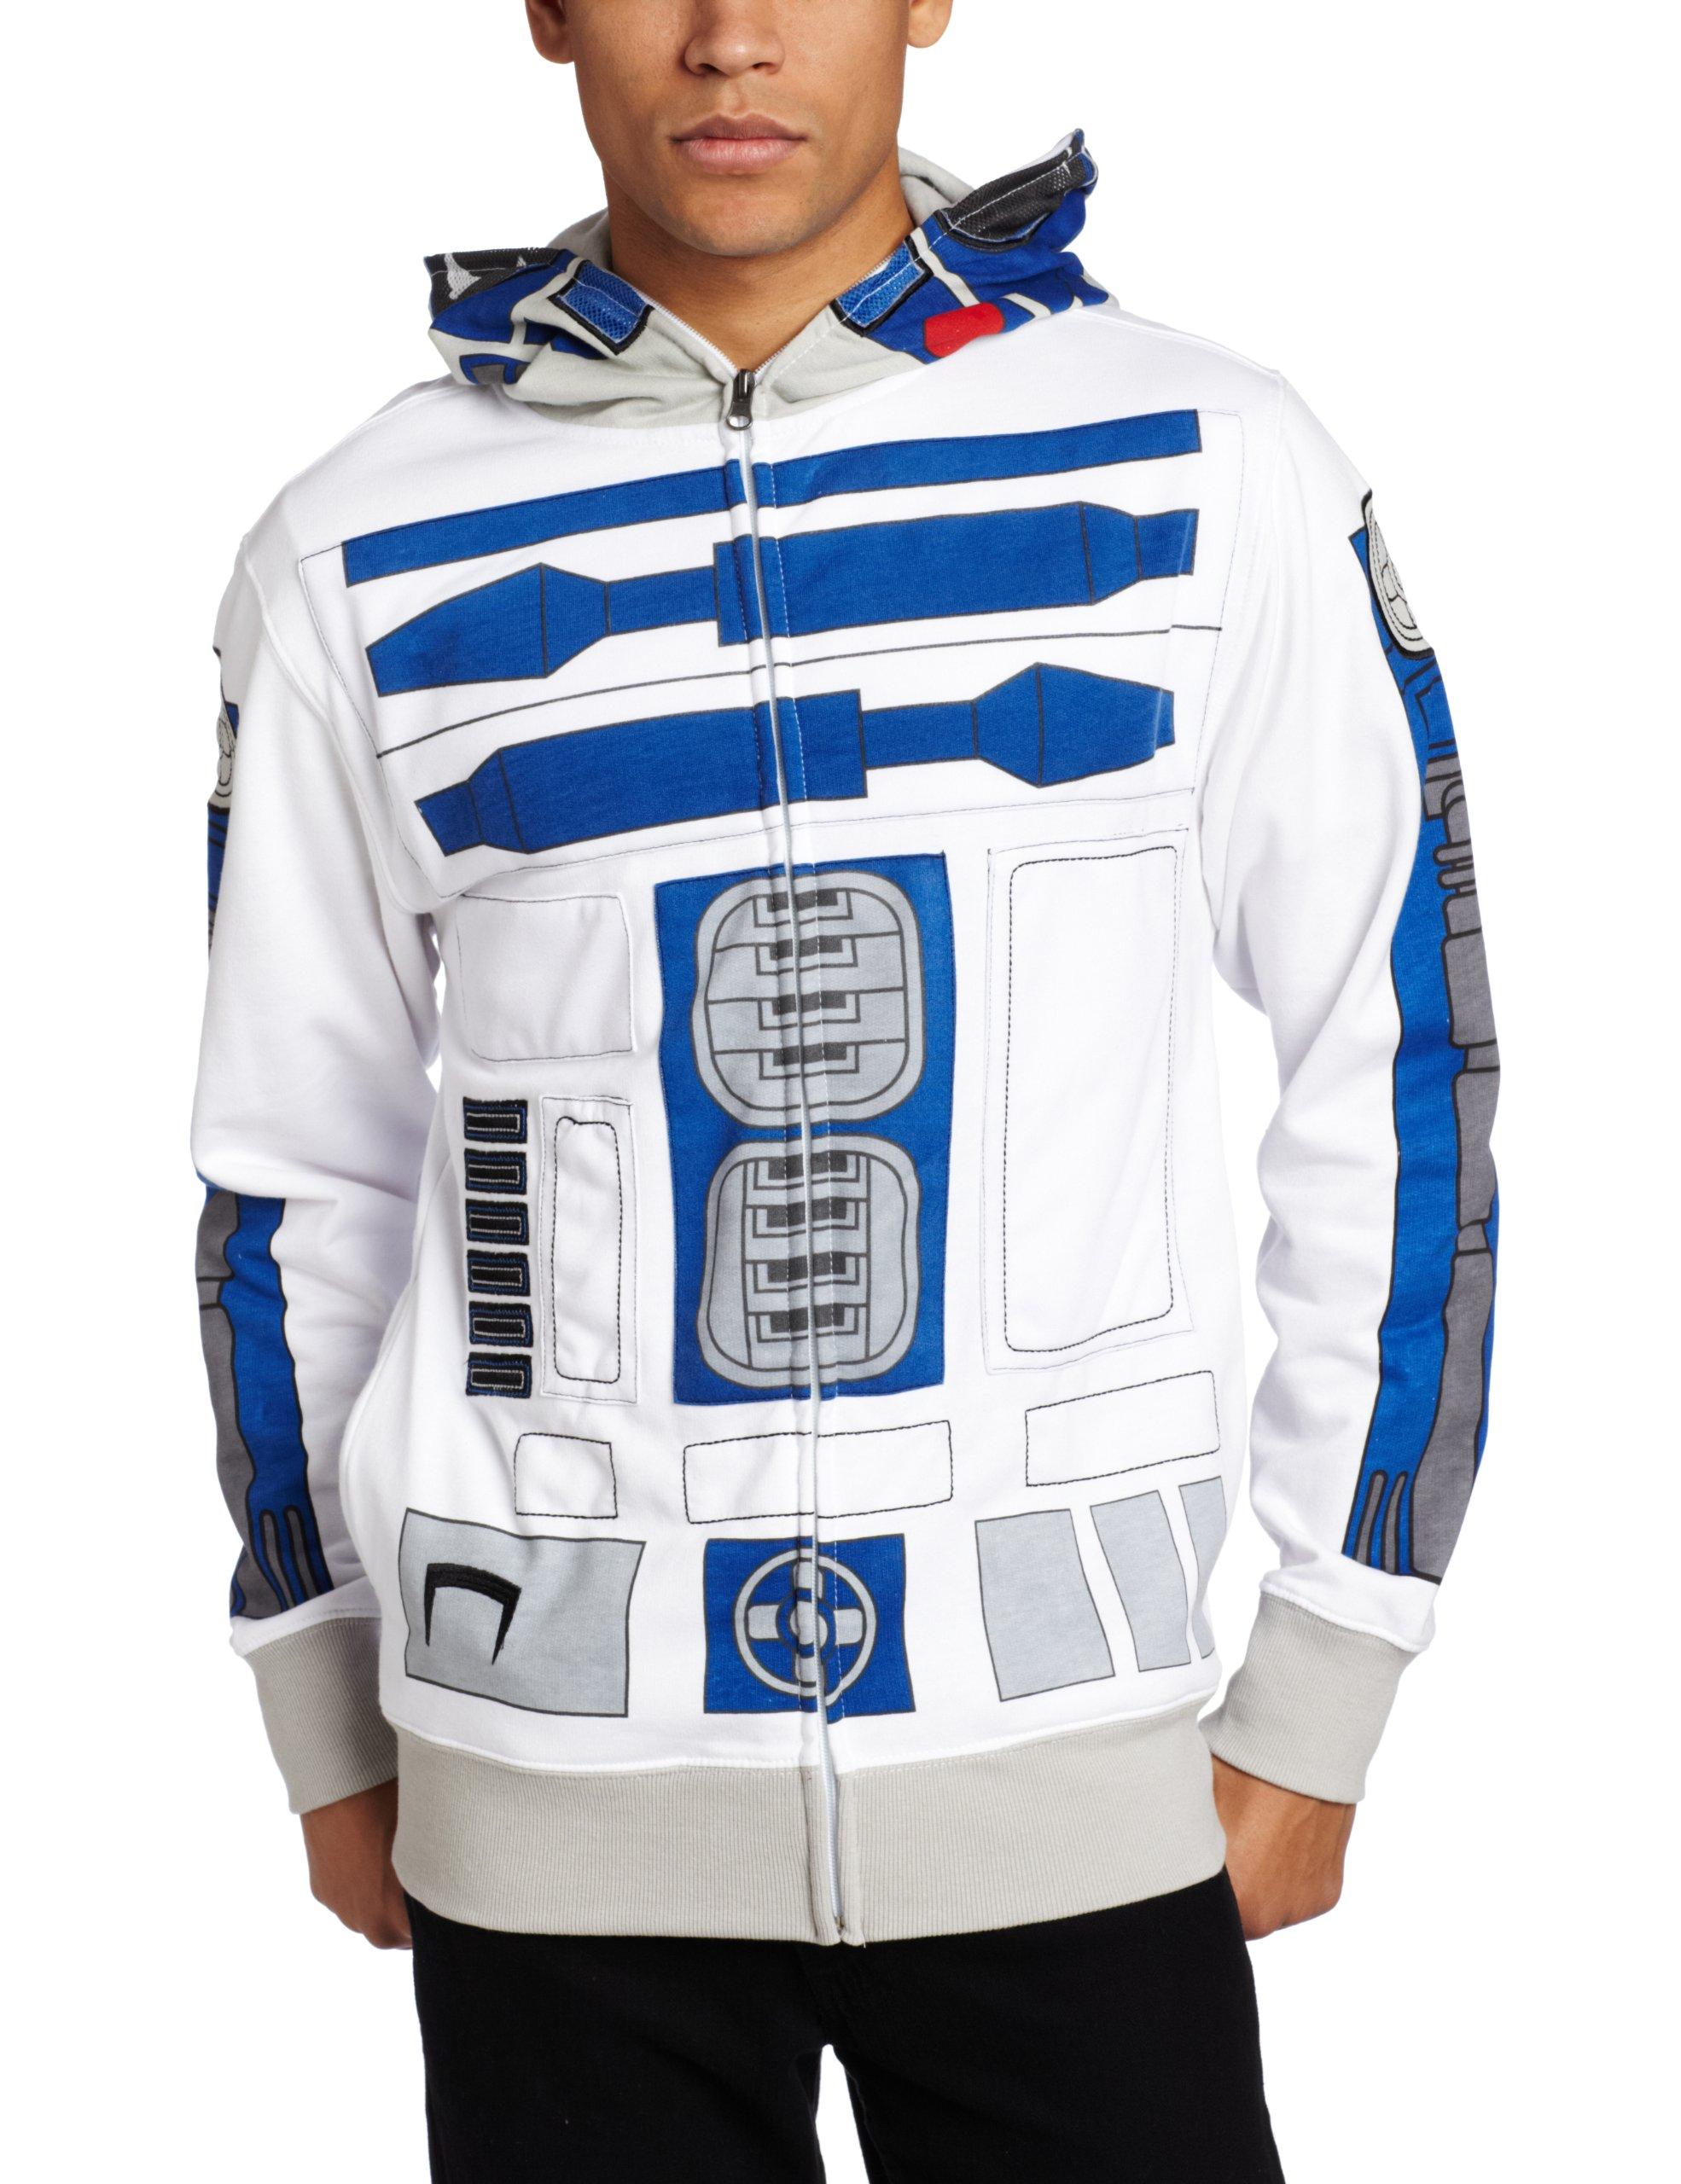 Star Wars I Am R2-D2 Costume Hoodie Sweatshirt